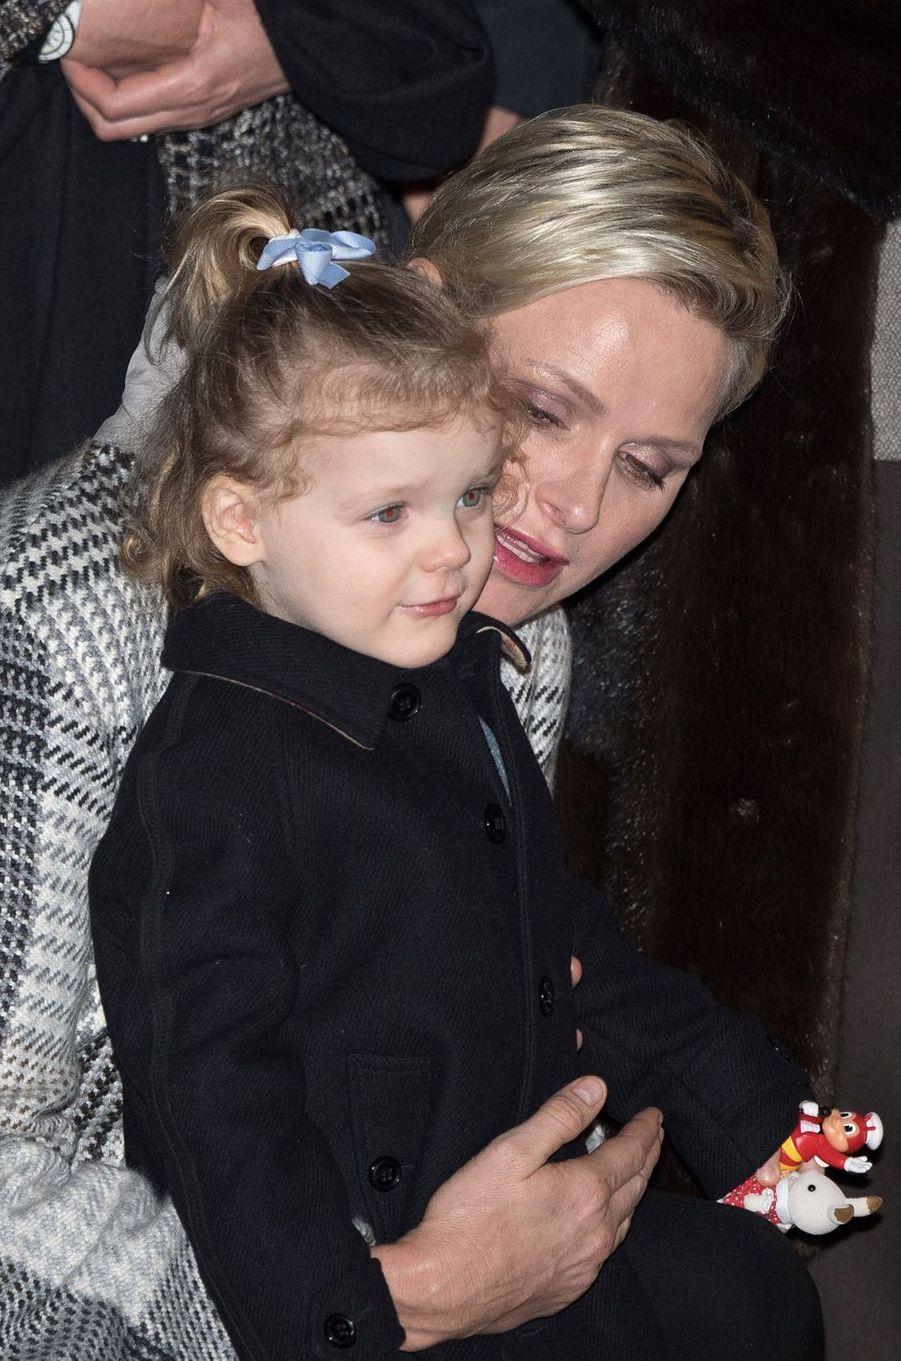 La princesse Charlène de Monaco avec sa fille la princesse Gabriella, le 26 janvier 2018